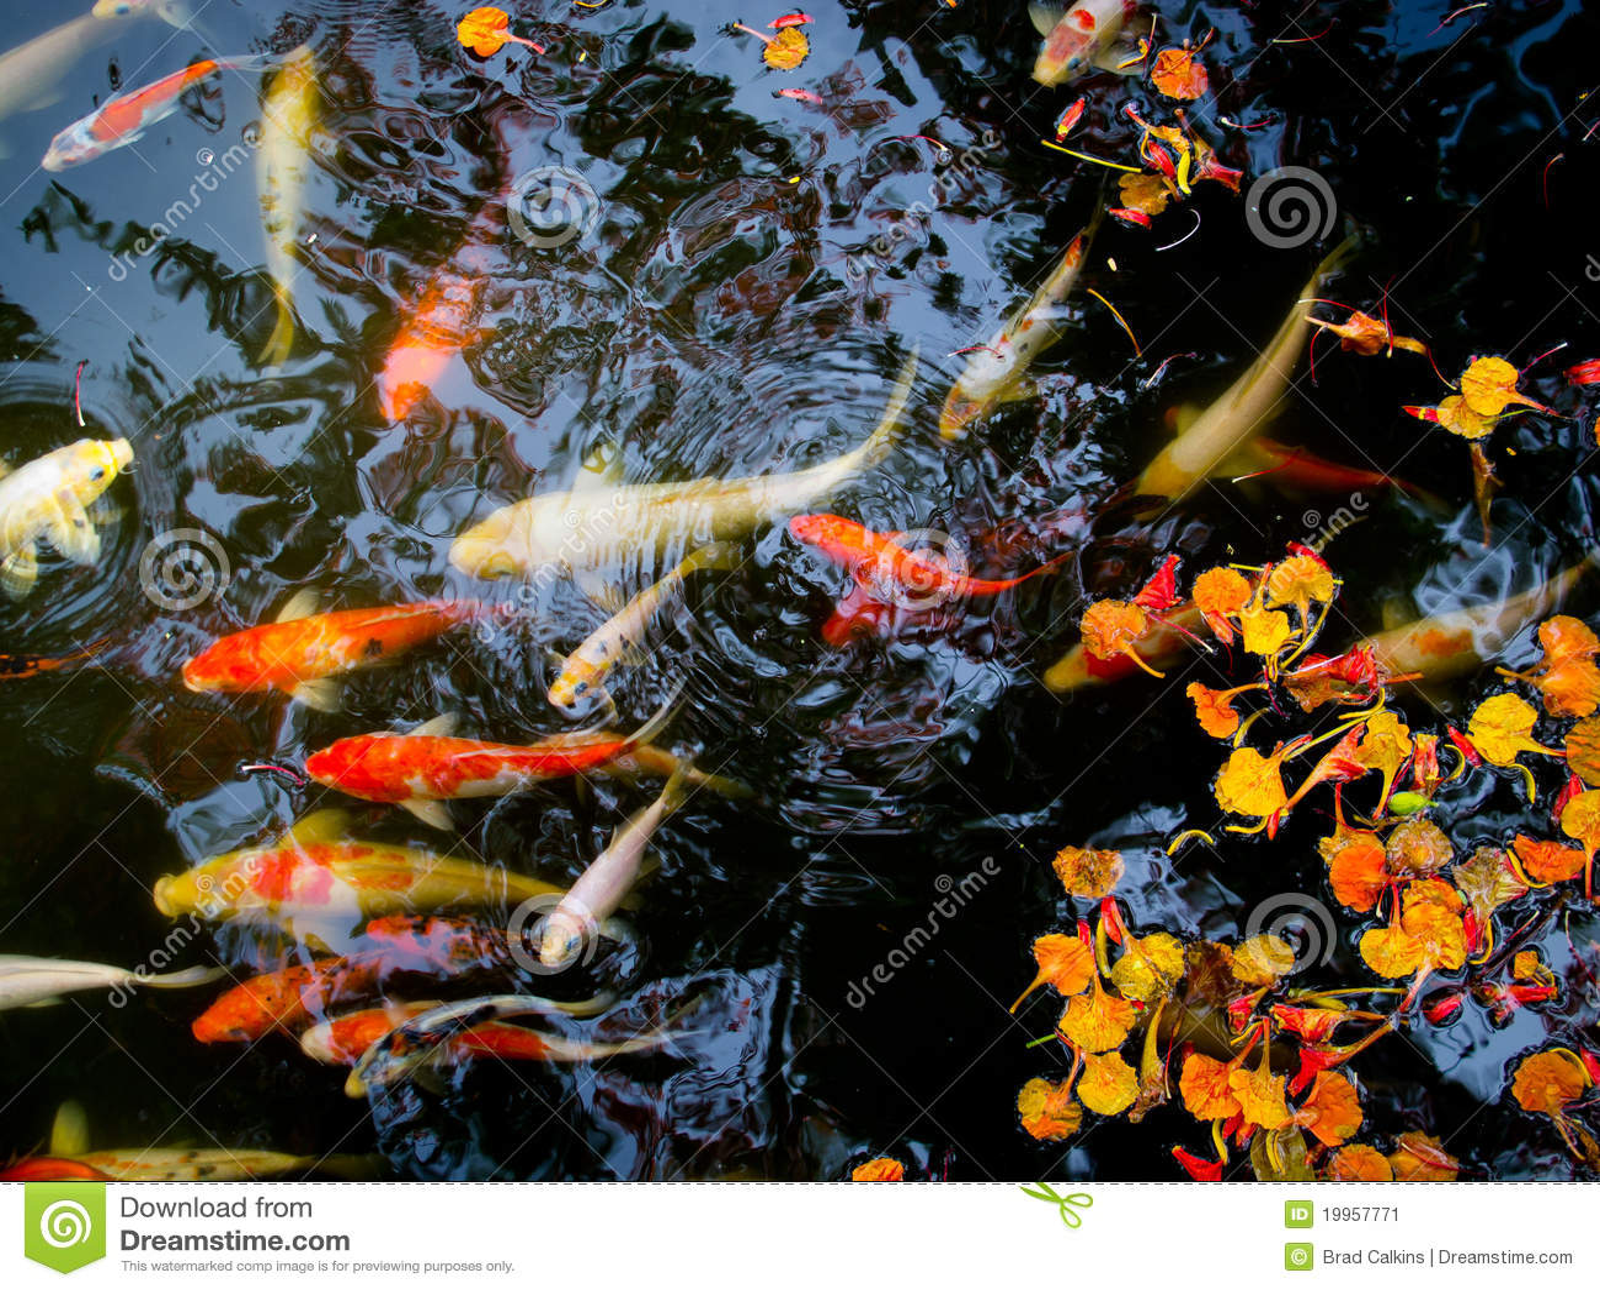 Orange fish with flowers cartoon vector cartoondealer for Koi fish dealers